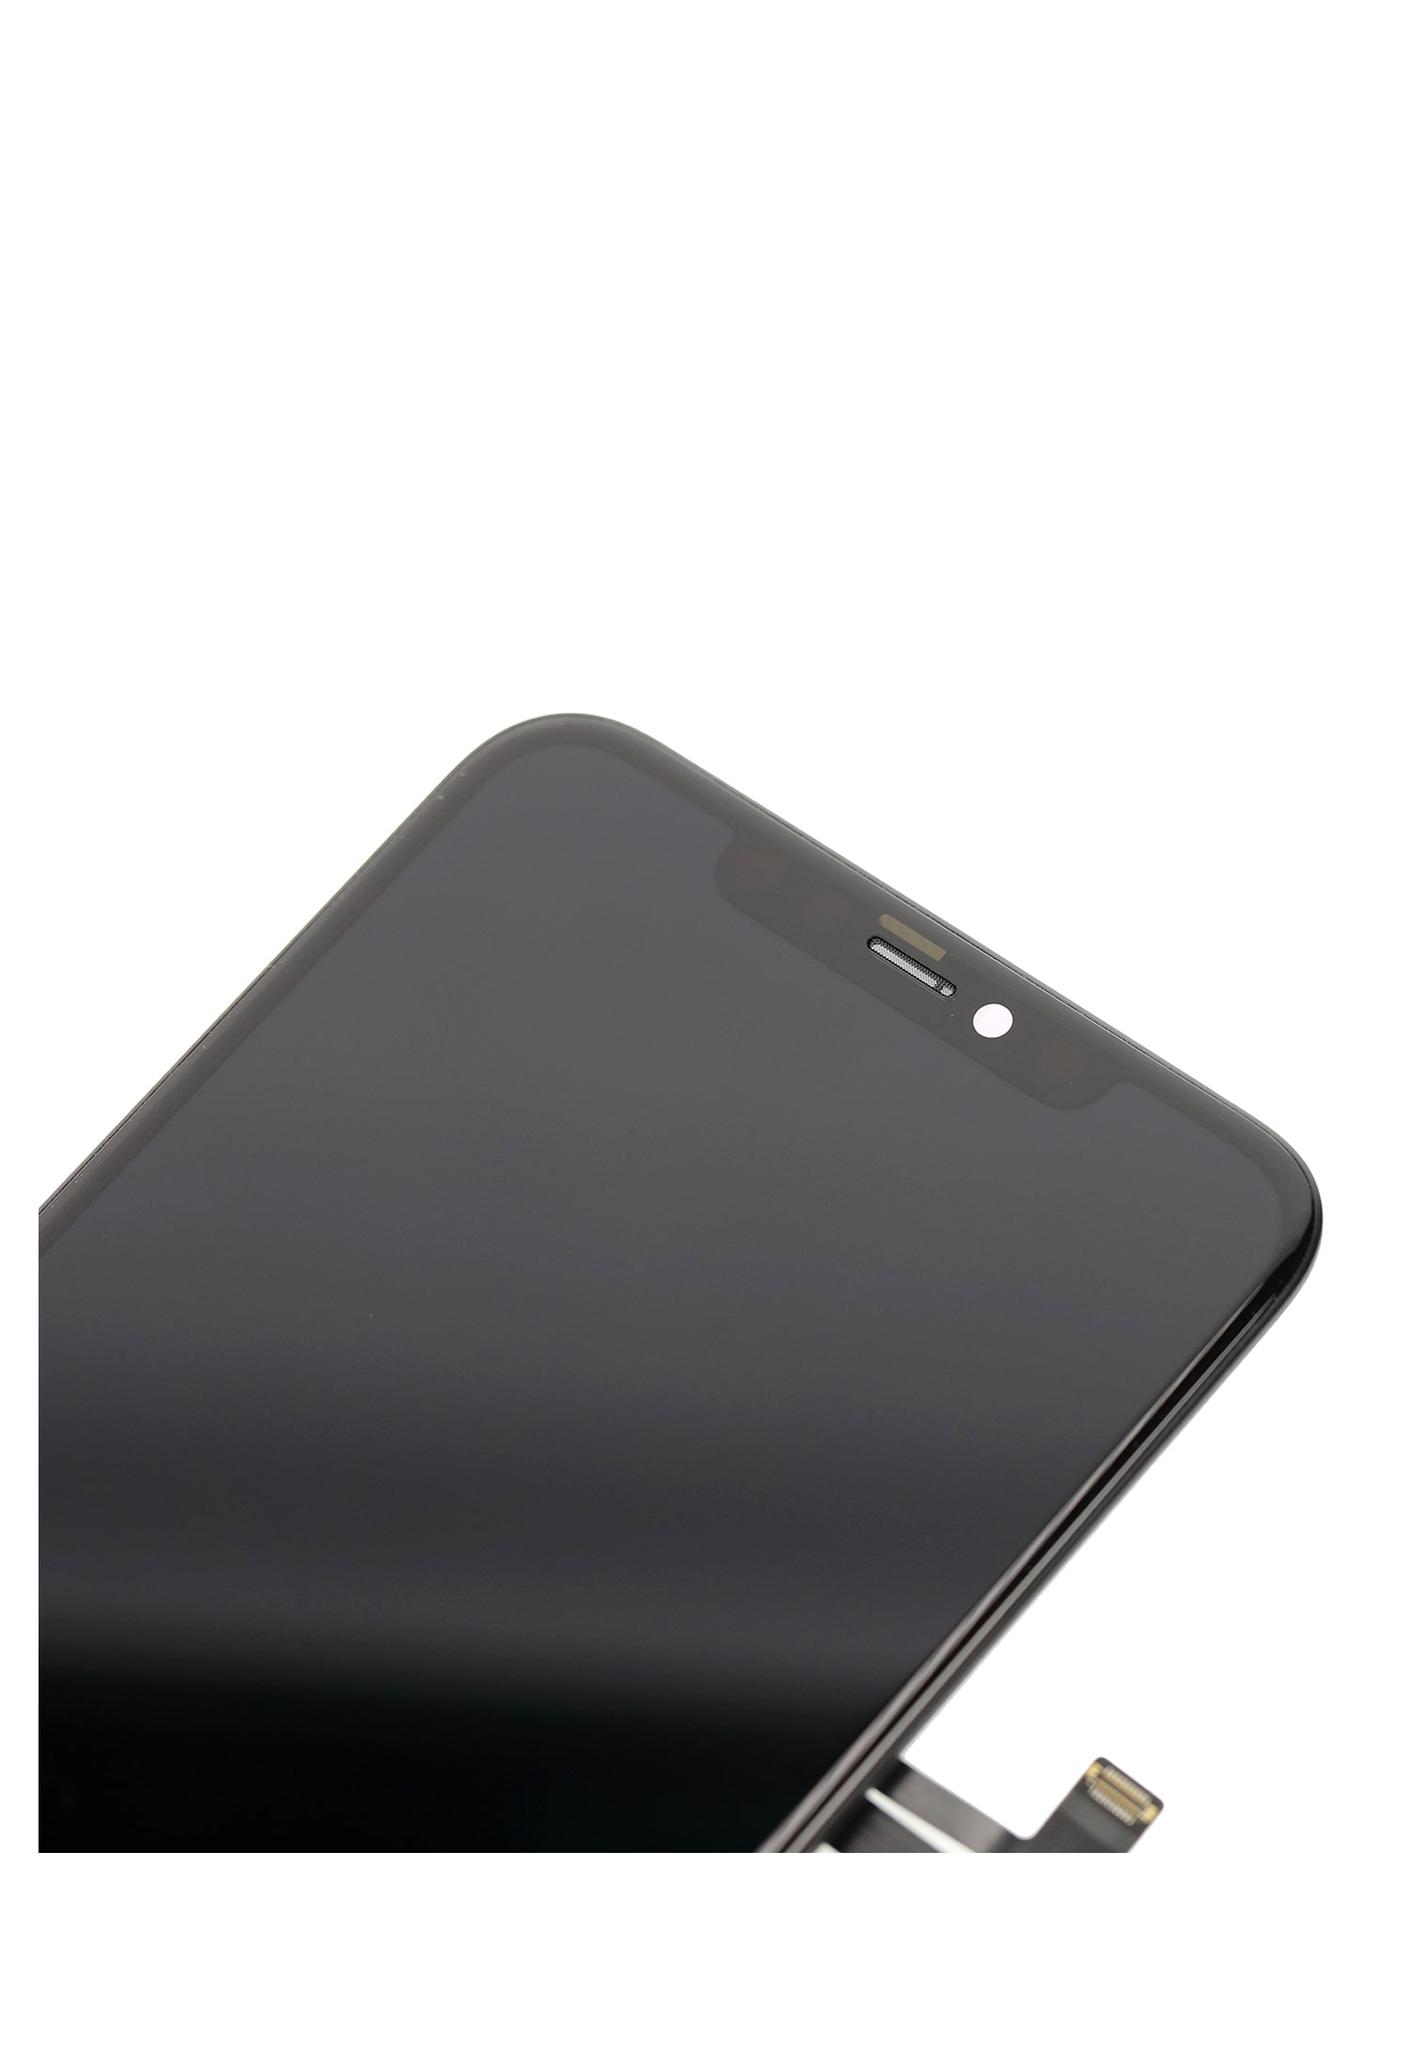 Apple iPhone 11 Pro A2215 Display Module Black Refurbished